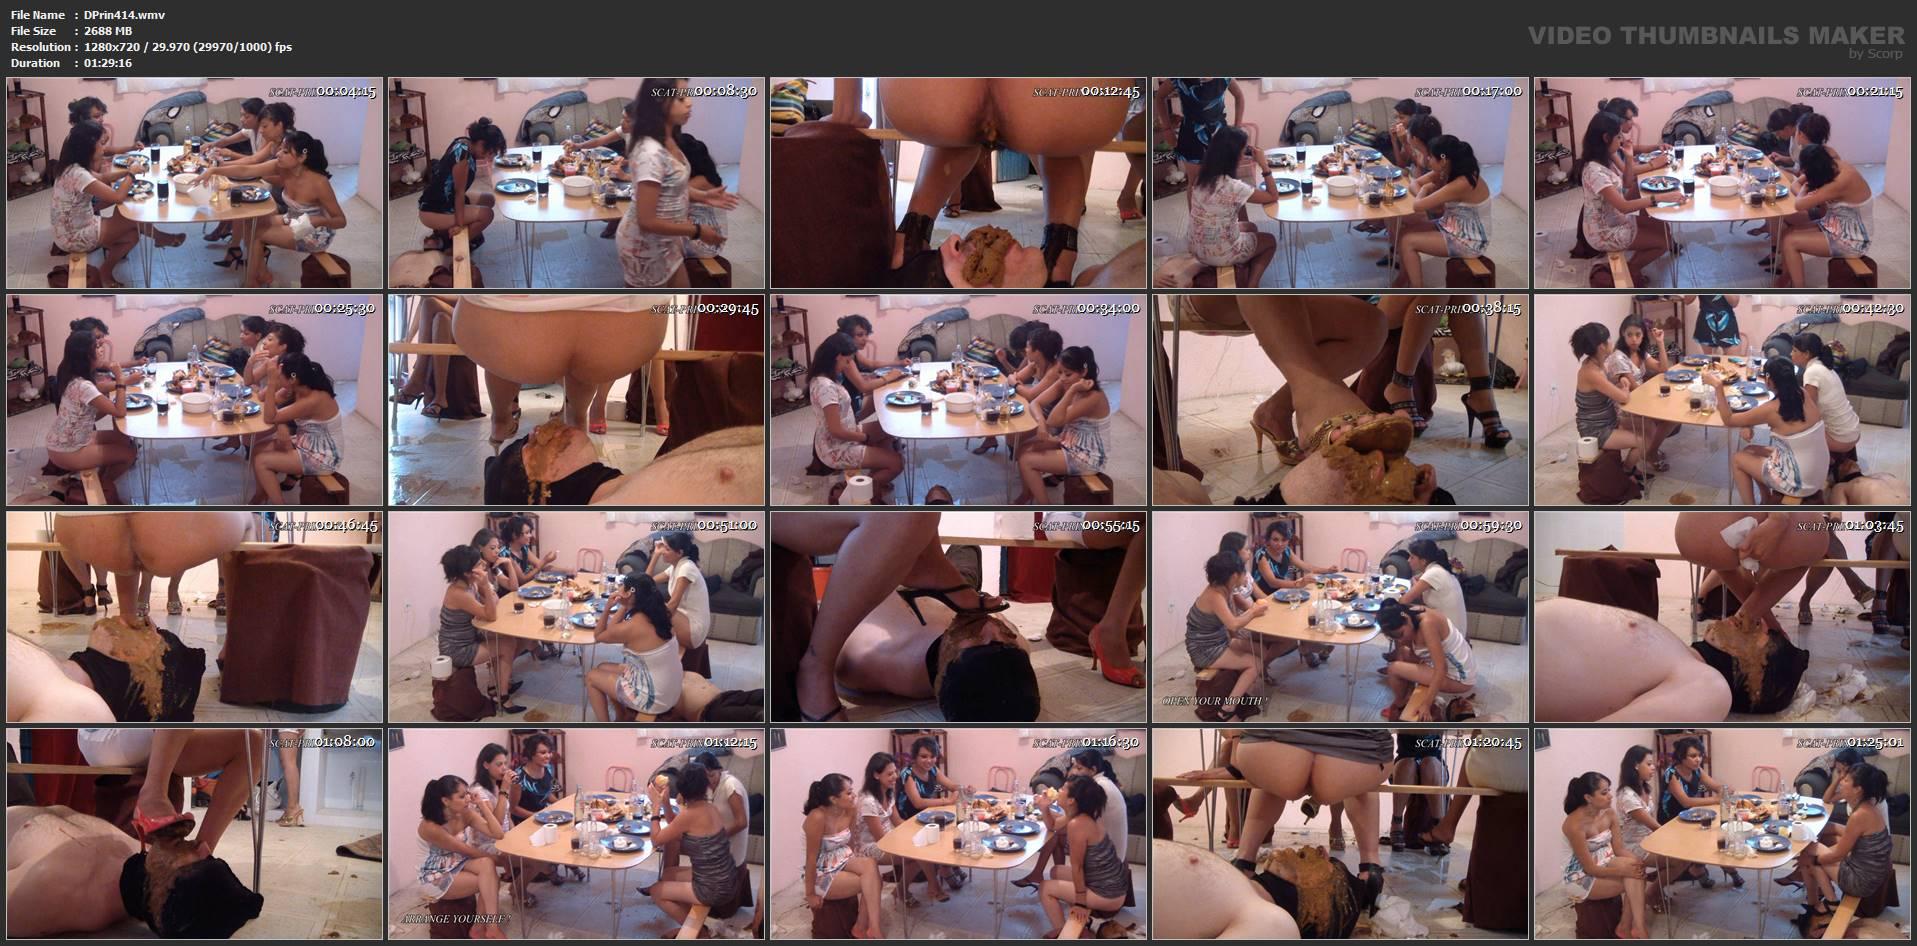 [DOM-PRINCESS] True Toiletslavery Subt [HD][720p][WMV]